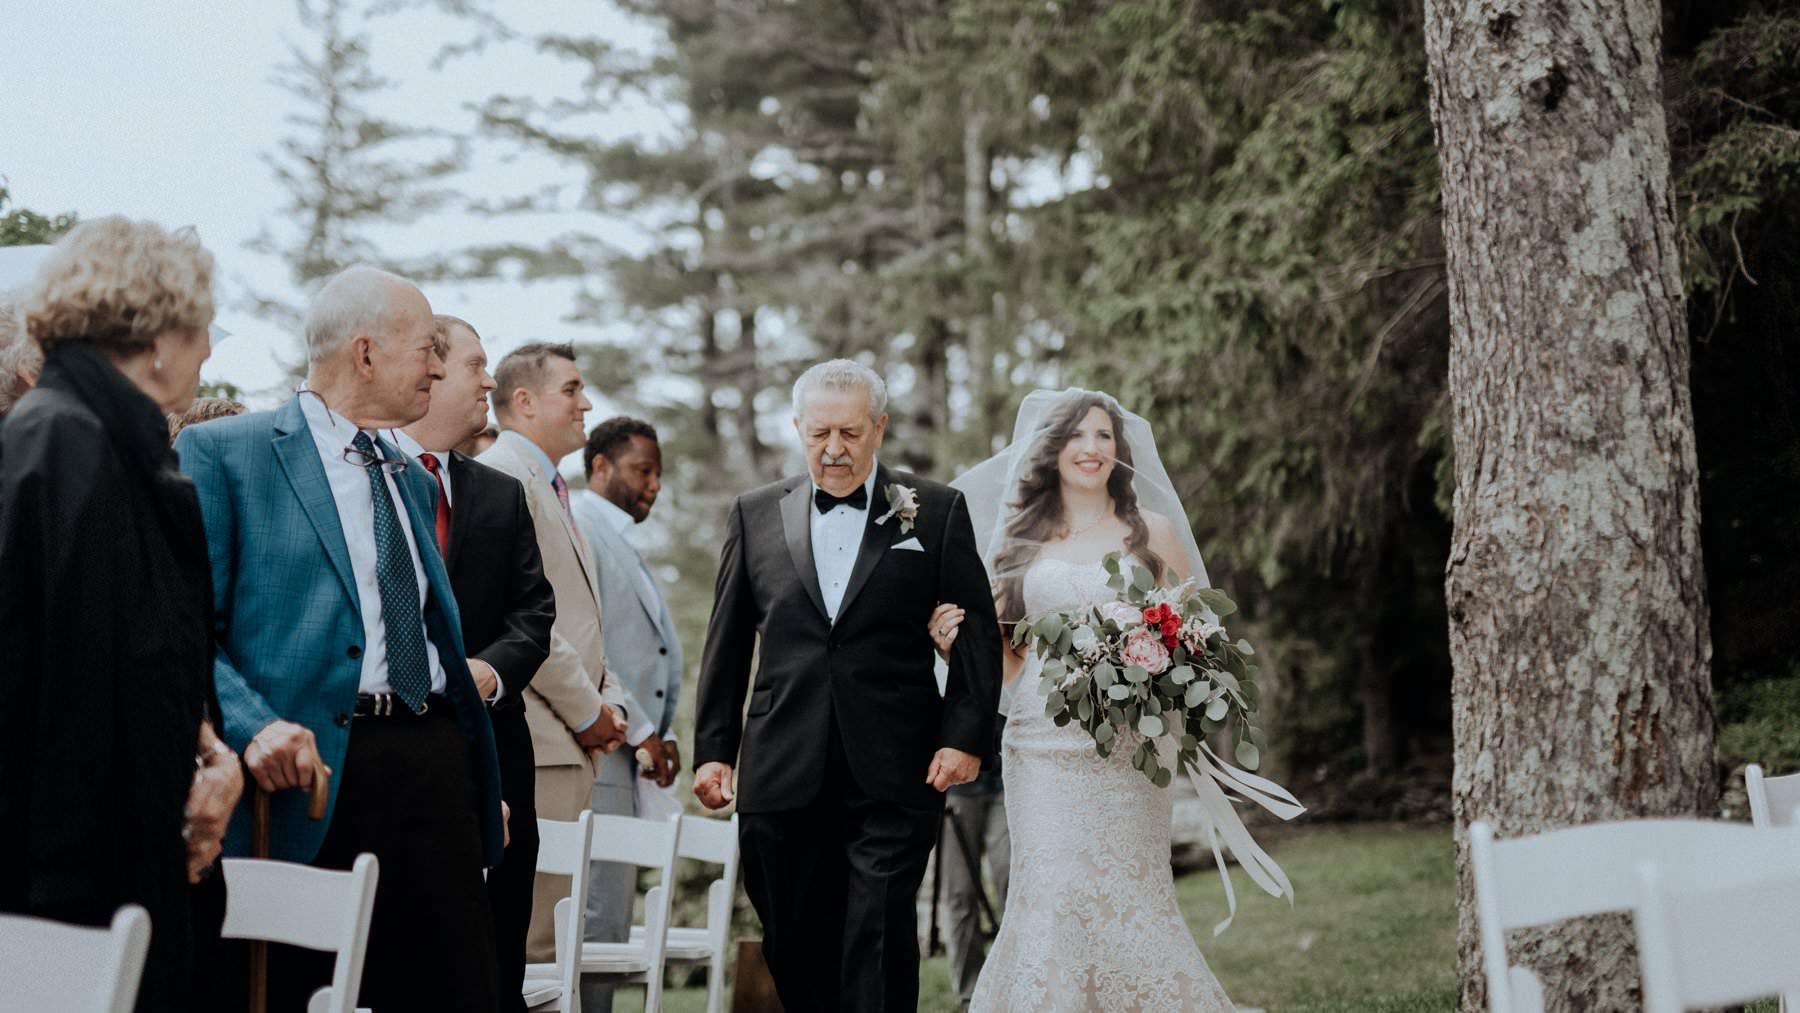 Onteora-Mountain-House-wedding-photographer-90.jpg